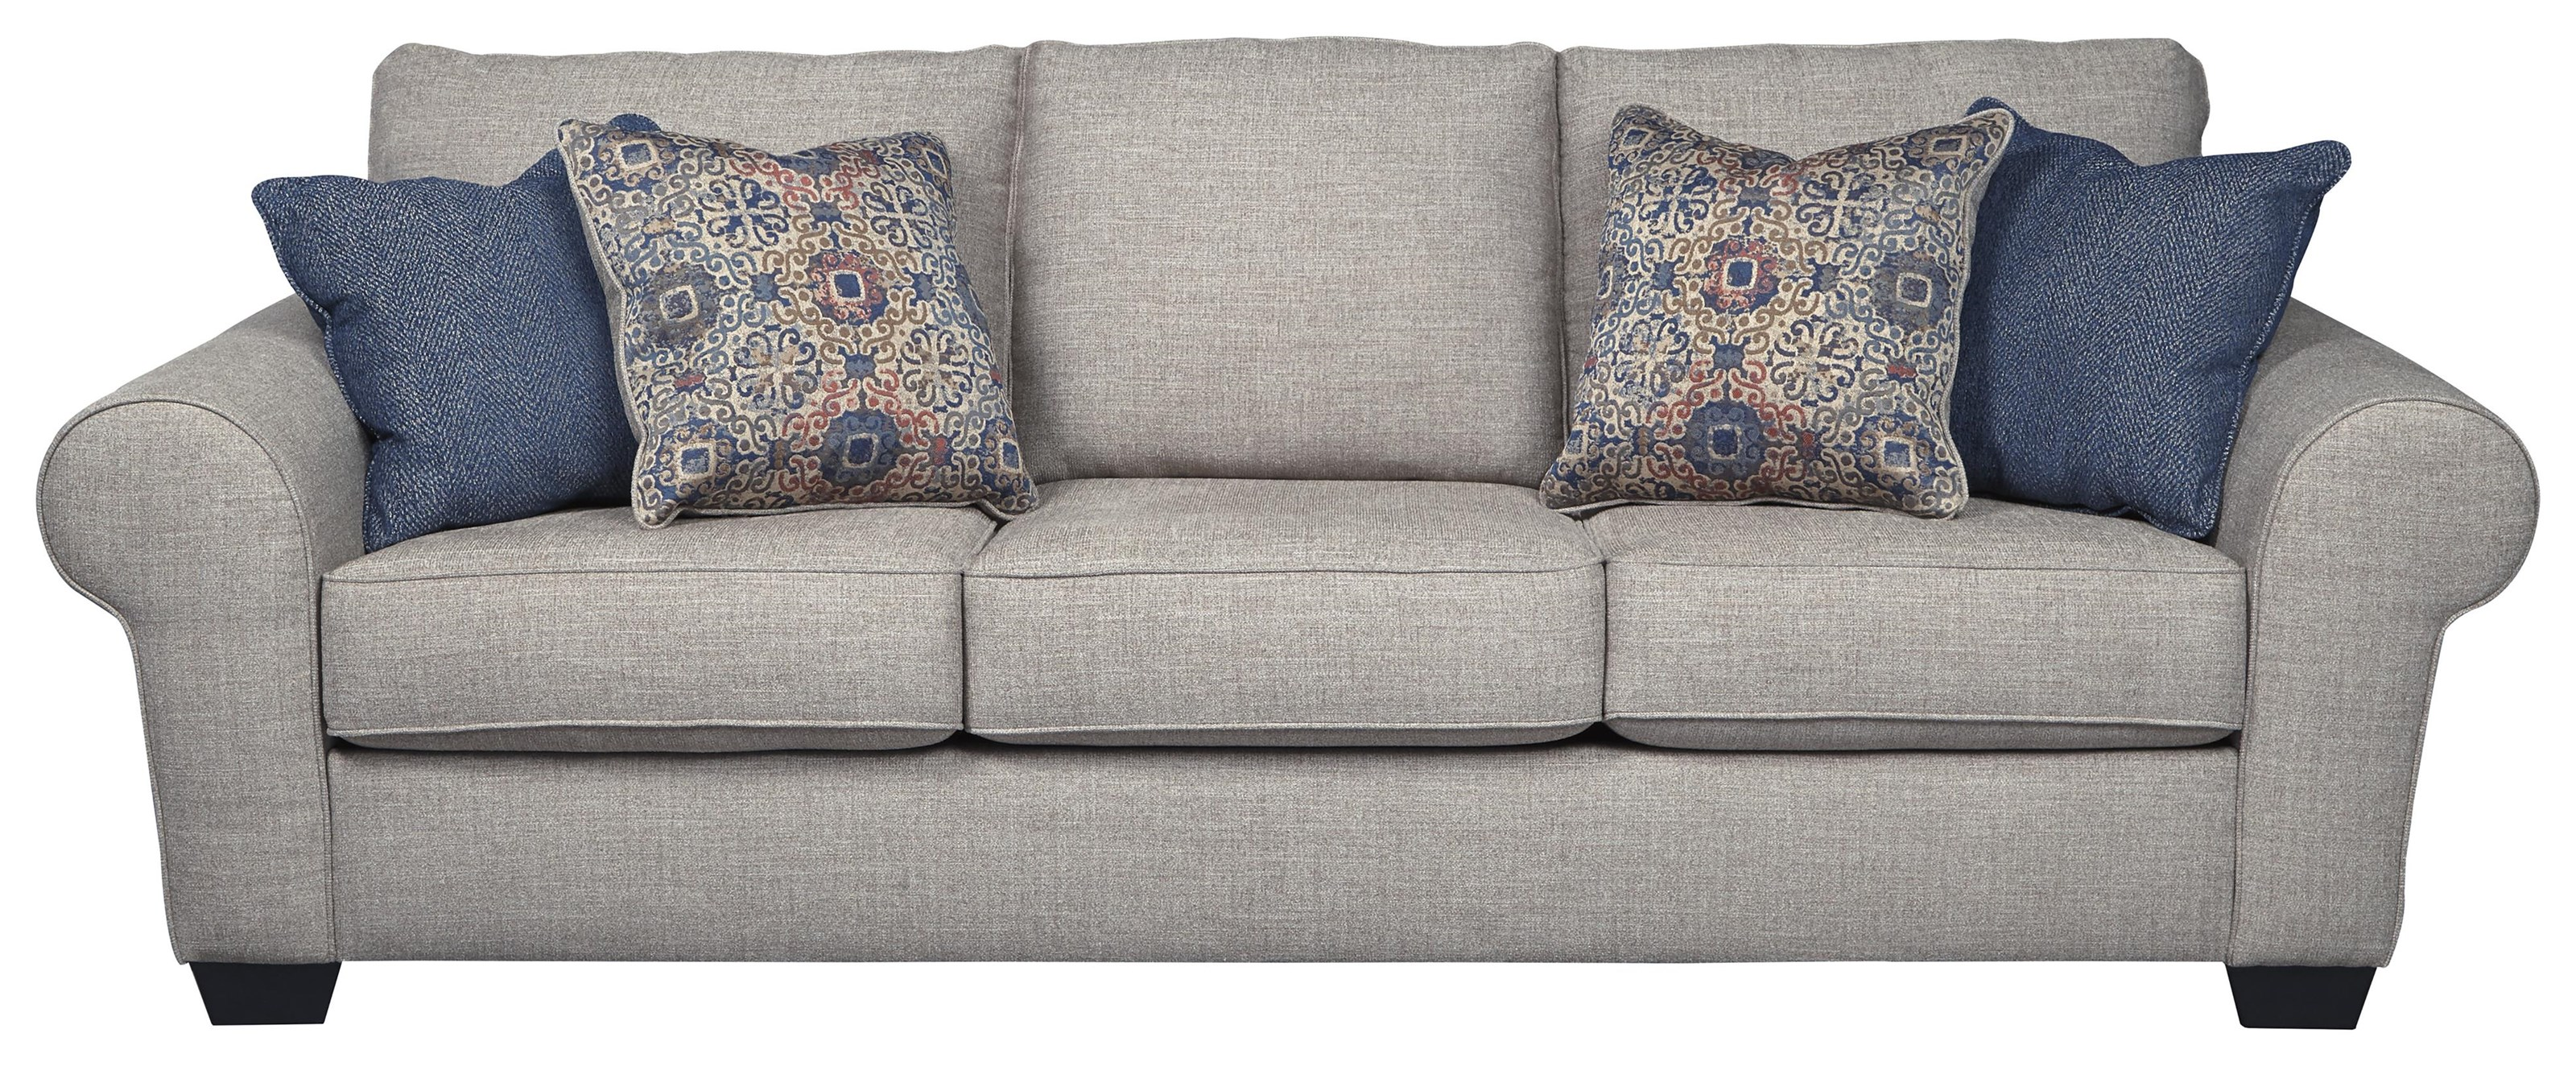 Ashley Furniture Belcampo 1340538 Sofa In Jute Fabric